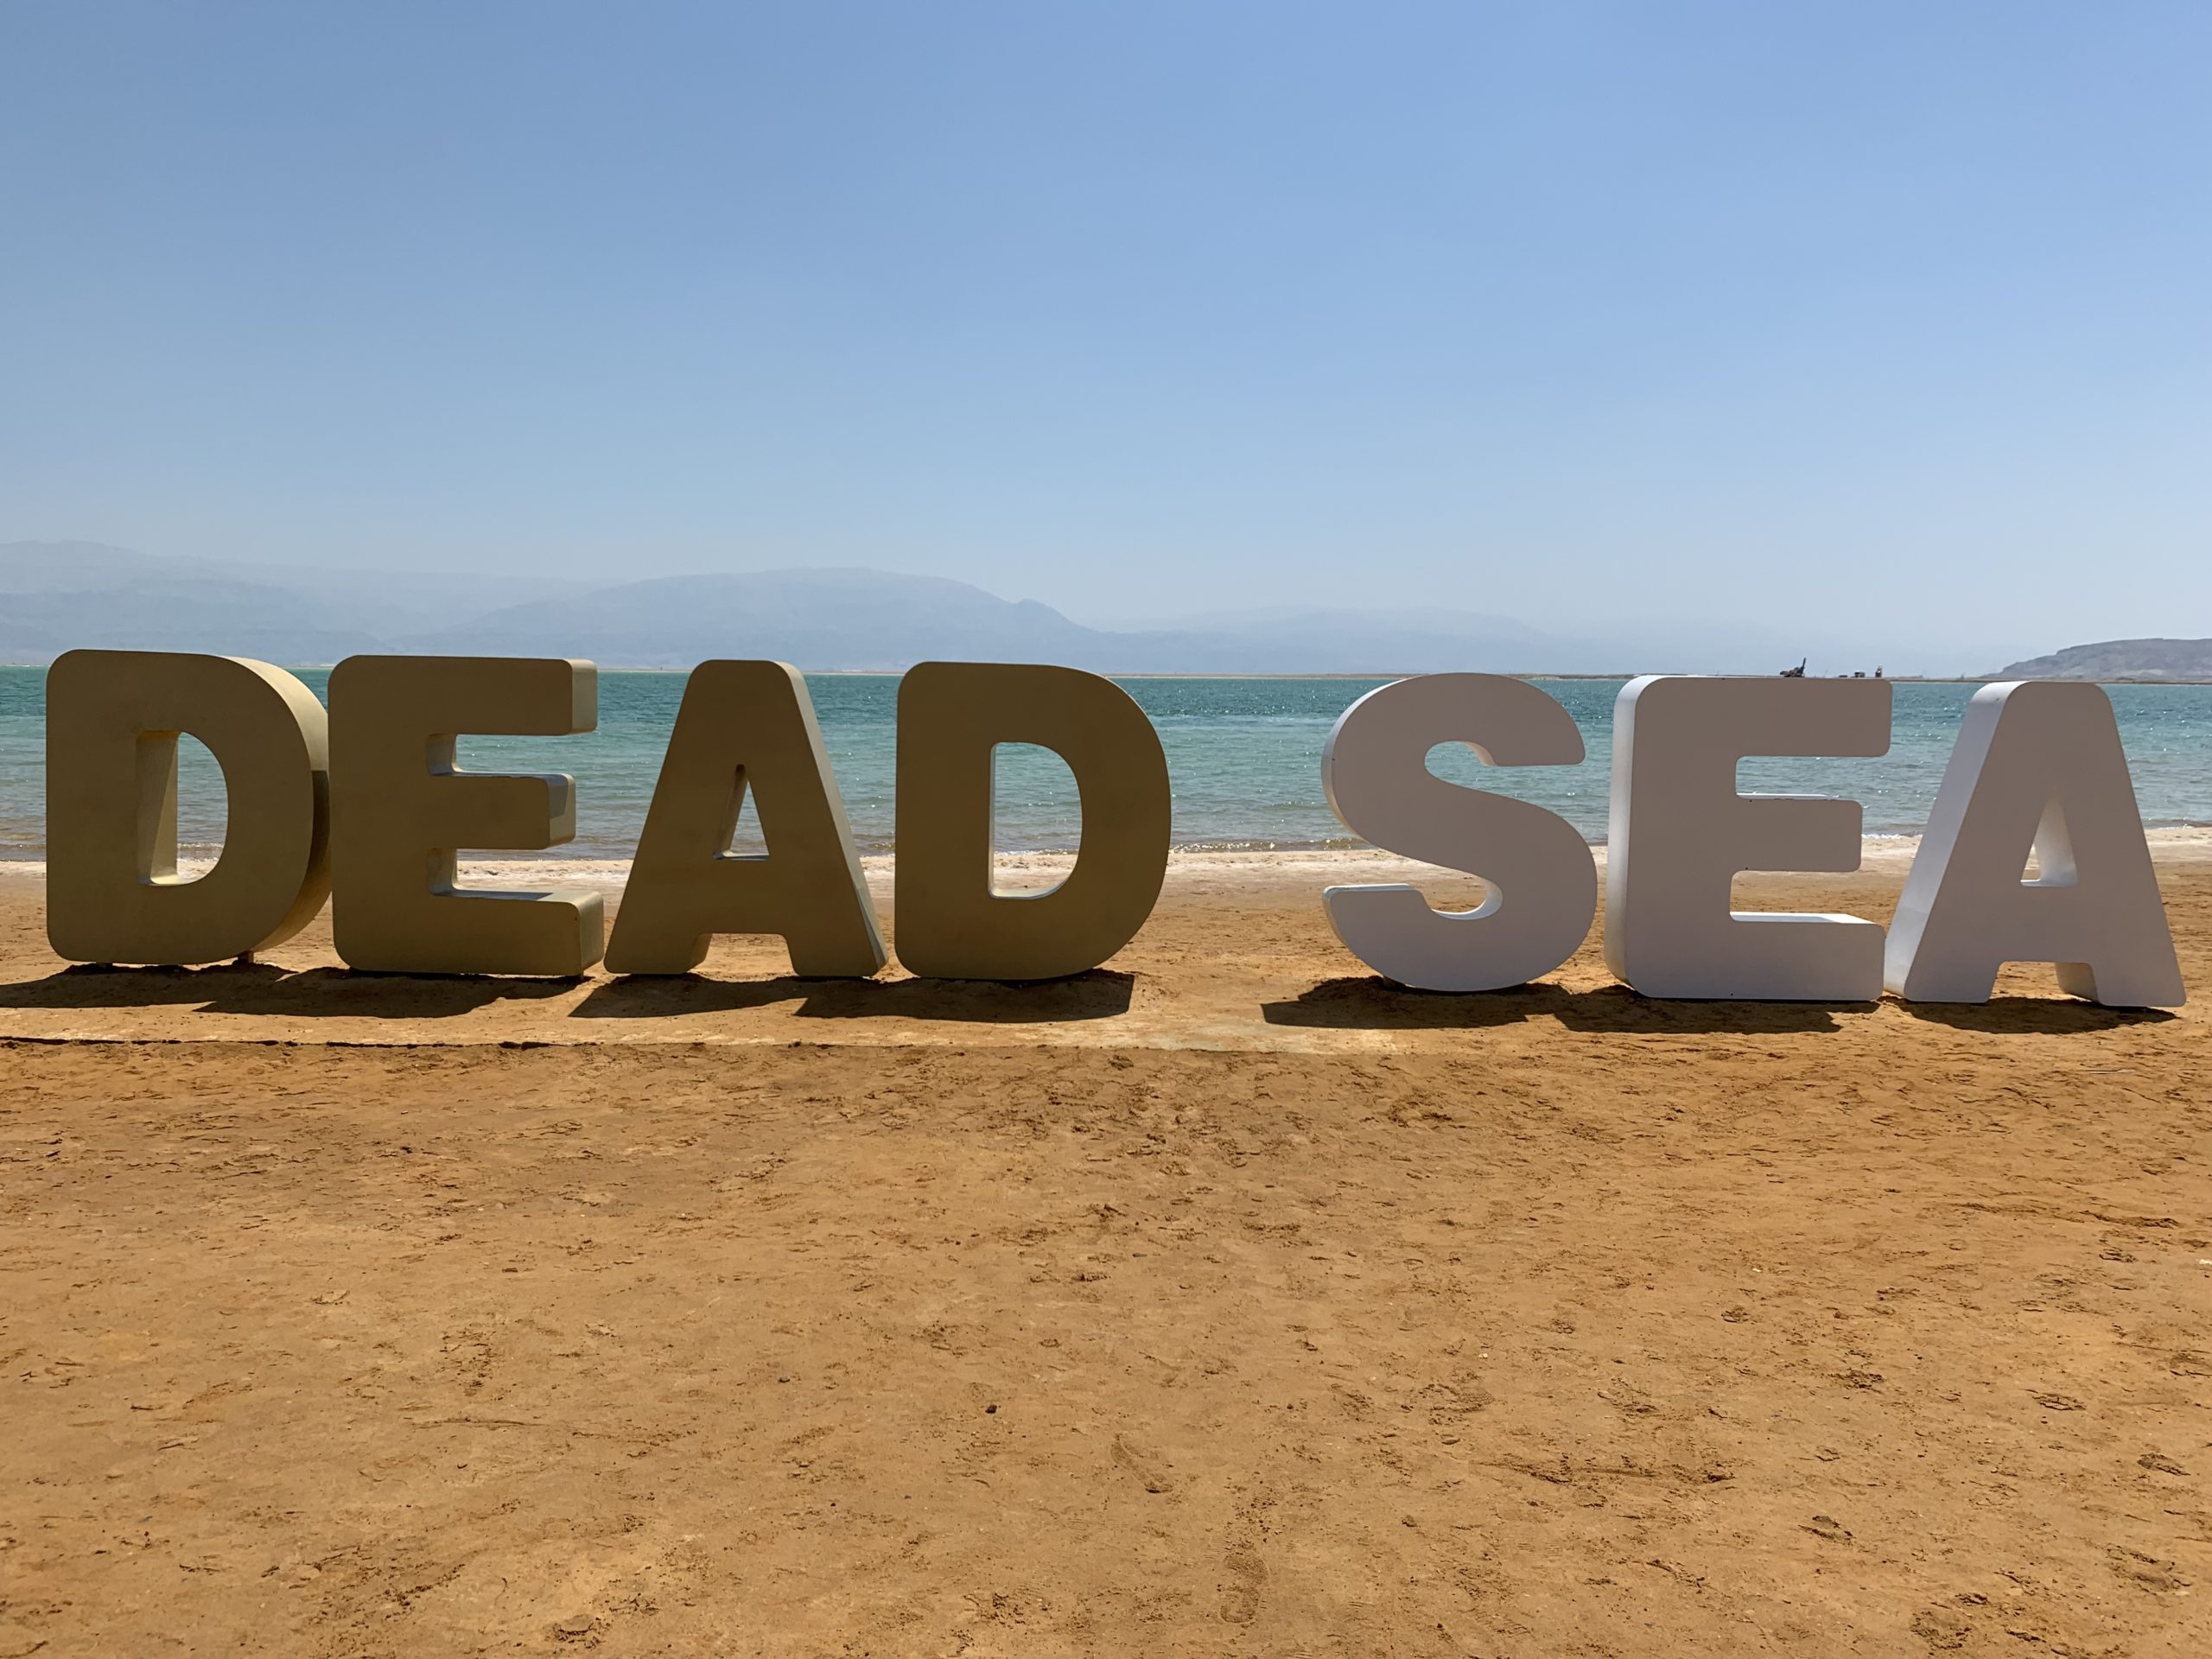 deadsea21